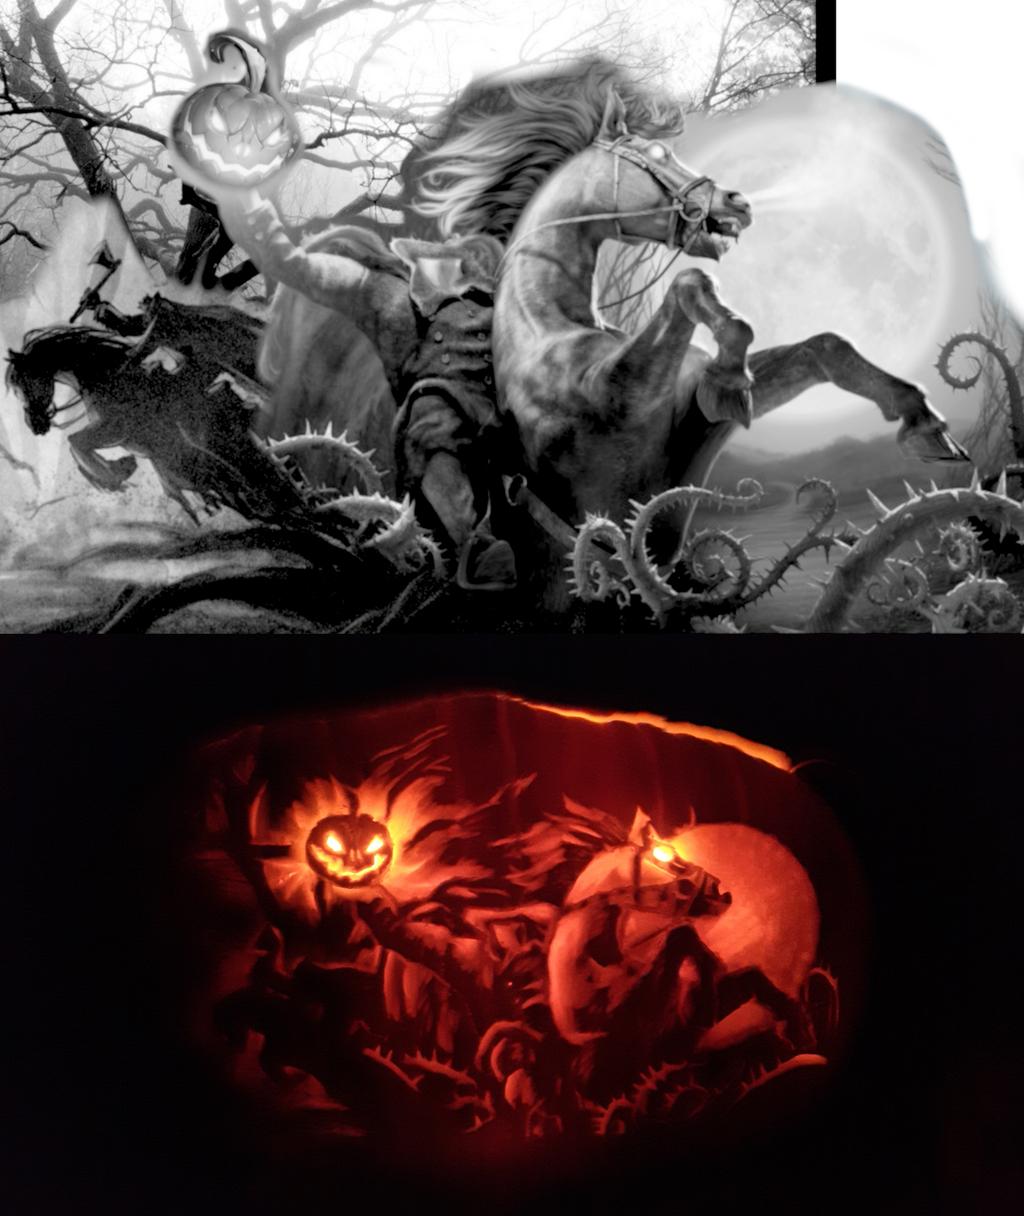 Most recent image: Pumpkin 2018